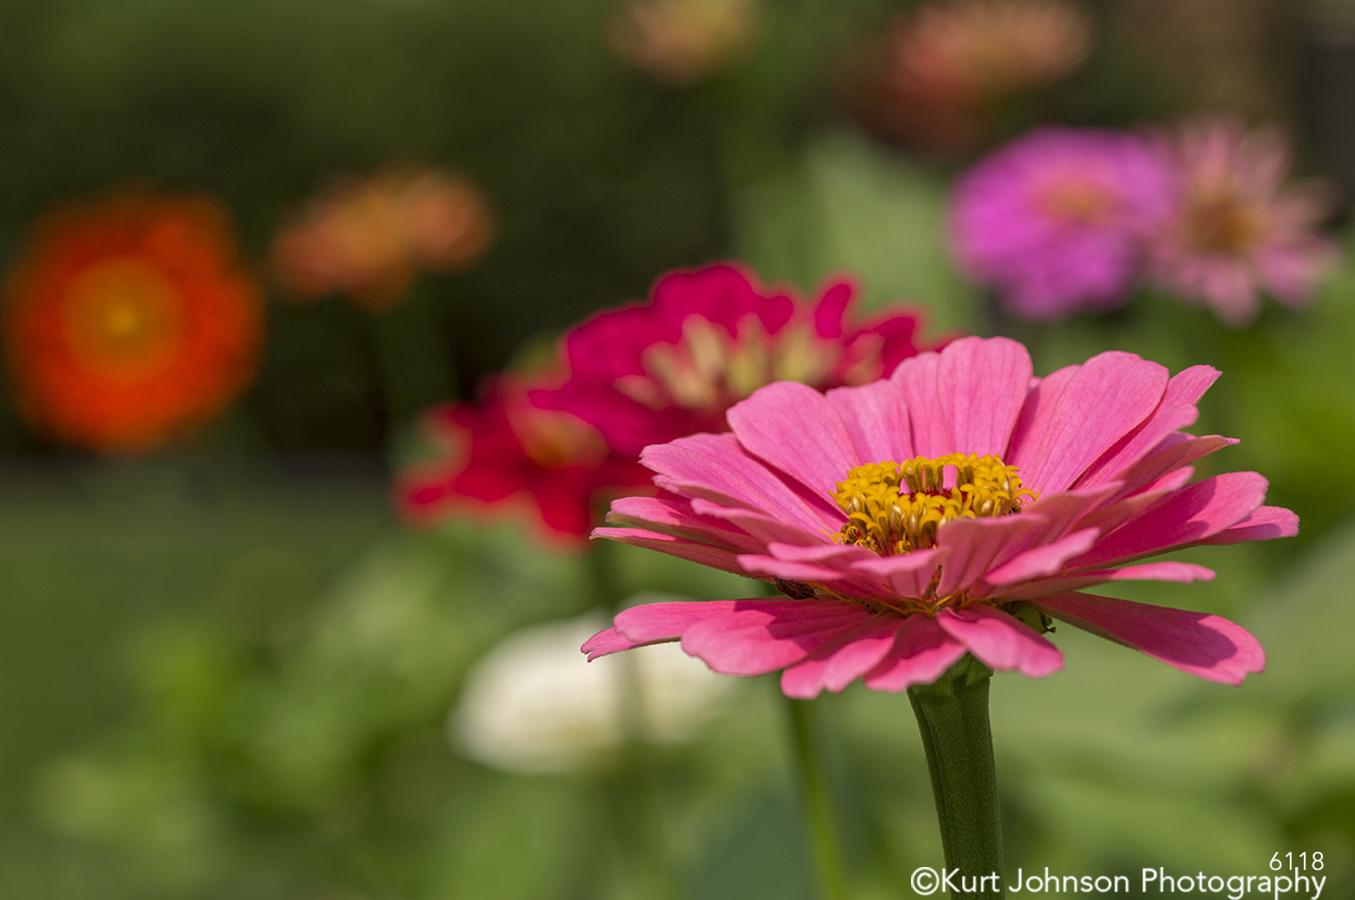 flower pink petals garden flowers